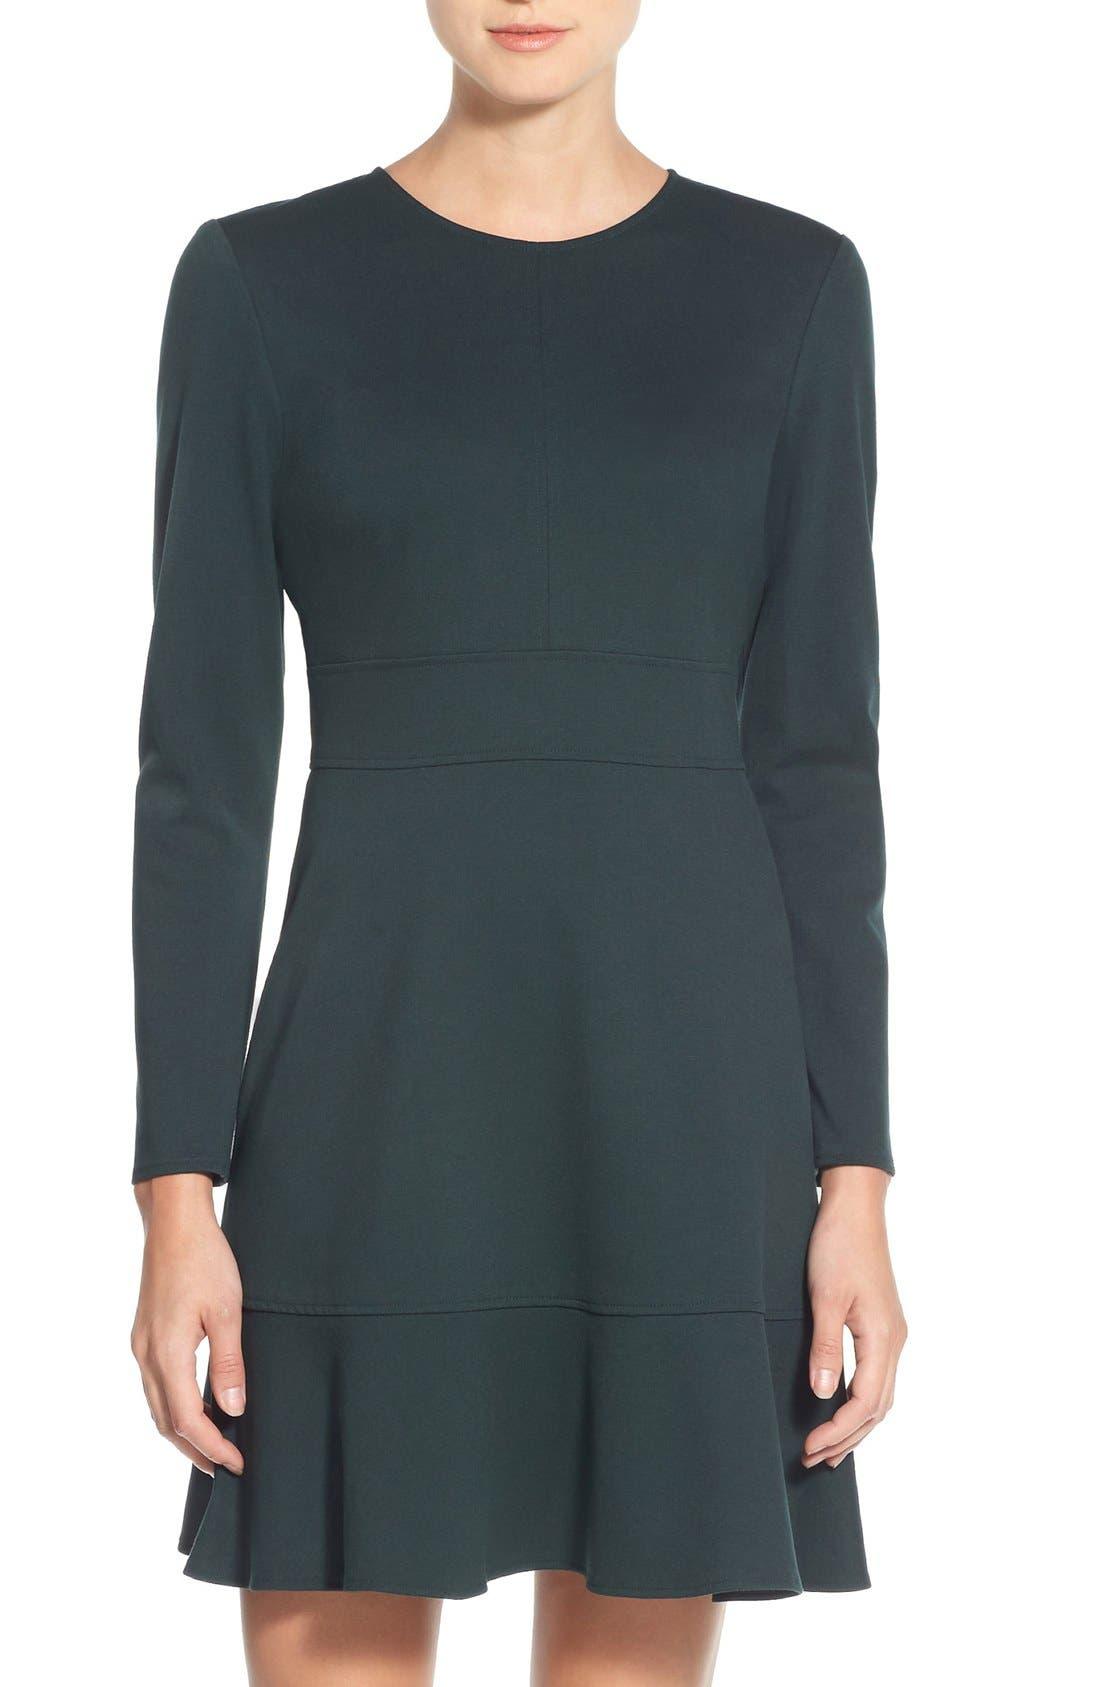 Alternate Image 1 Selected - Eliza J Ruffle Hem Stretch Fit & Flare Dress